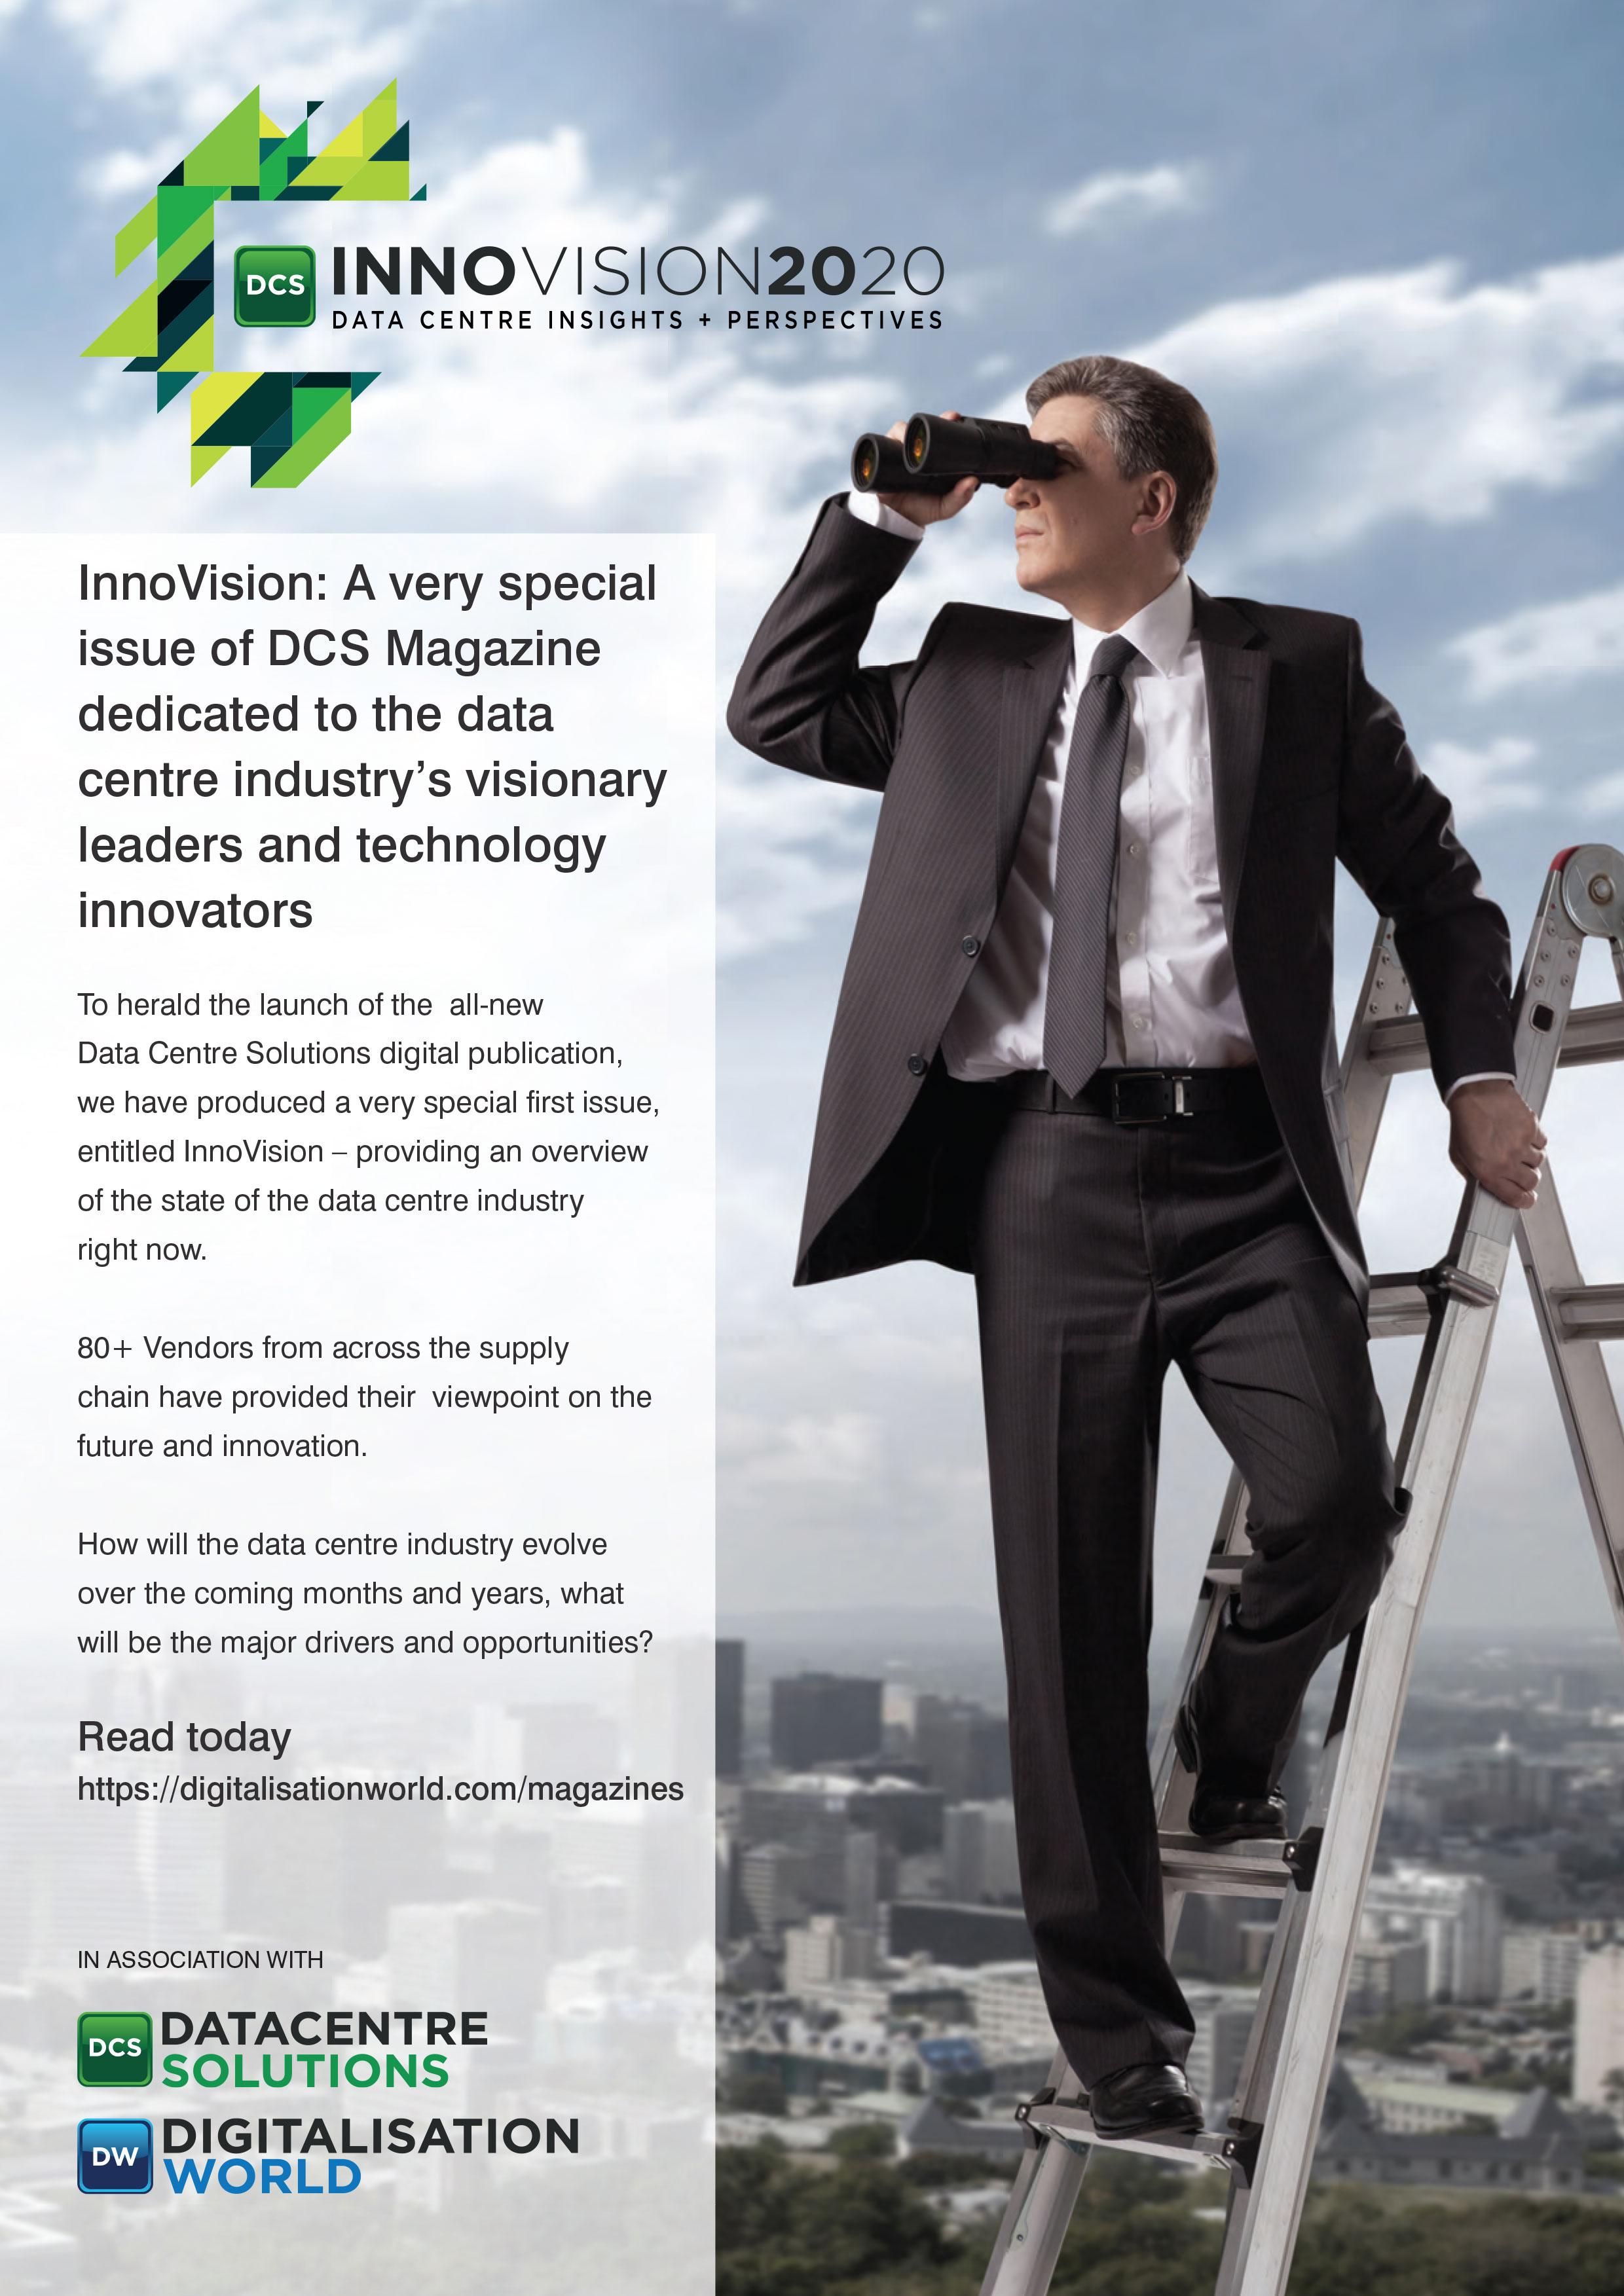 DCS Innovision